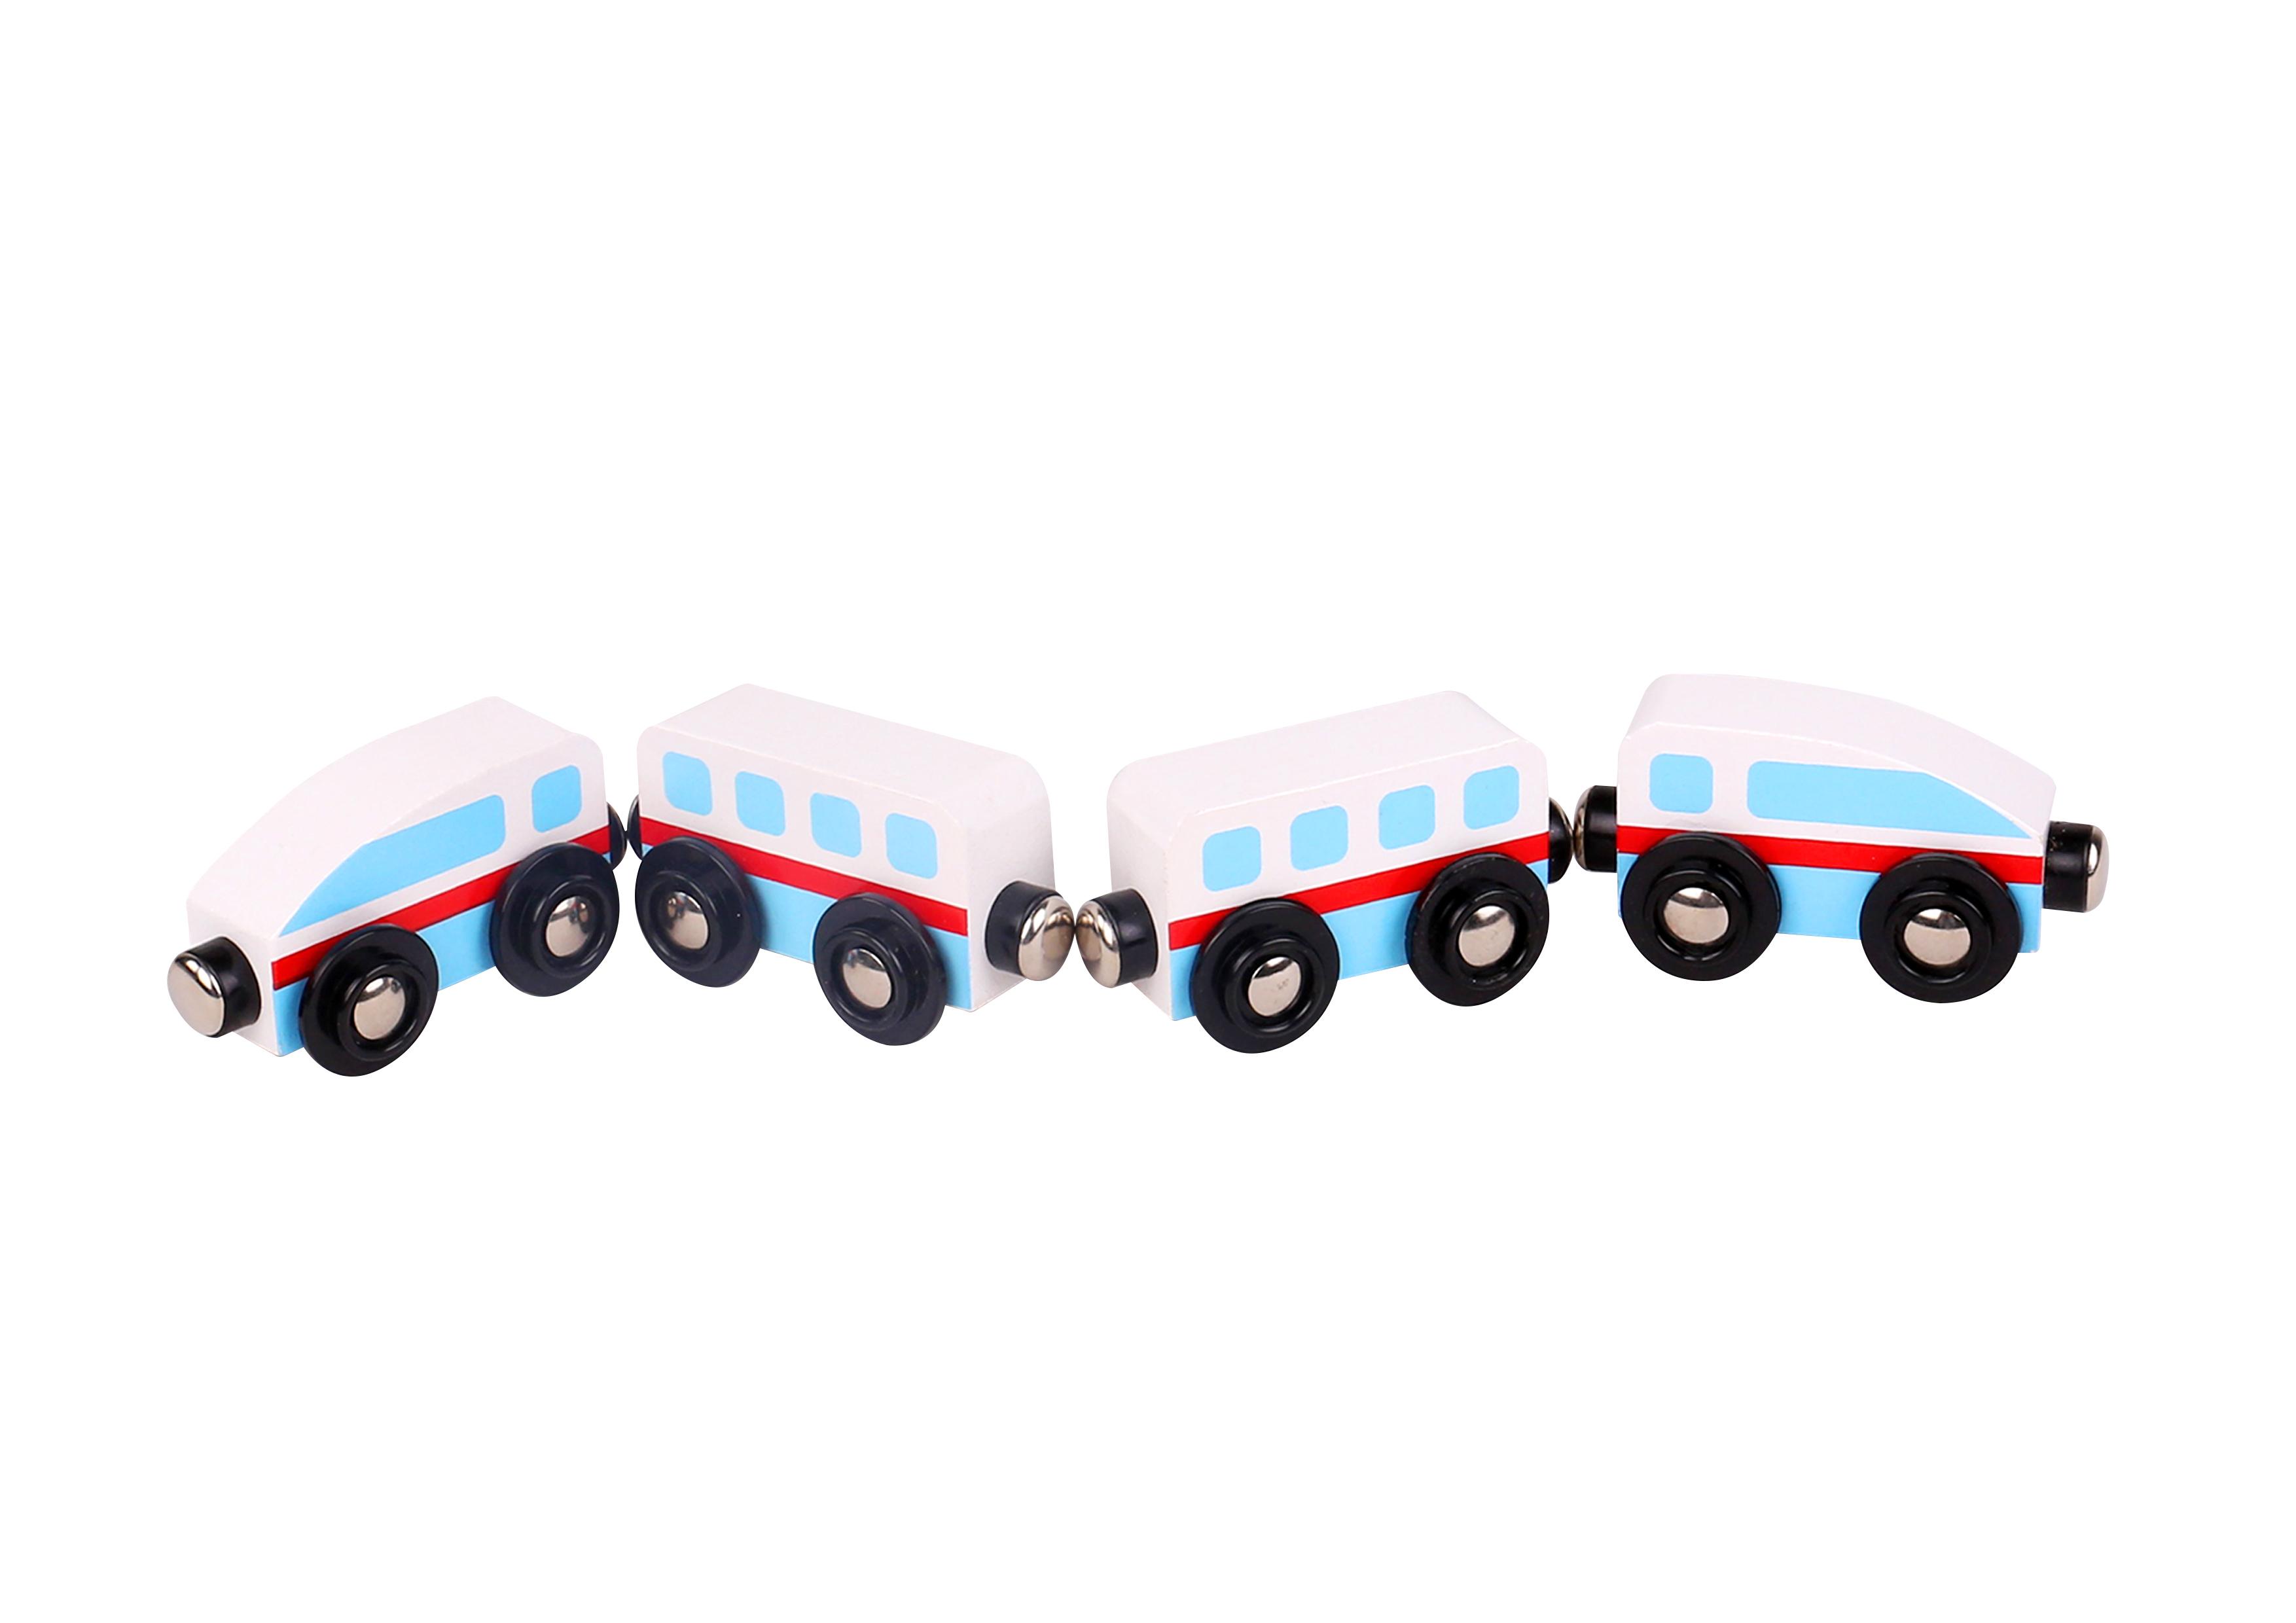 Trenulet lemn alb si albastru cu magnet tooky toy imagine